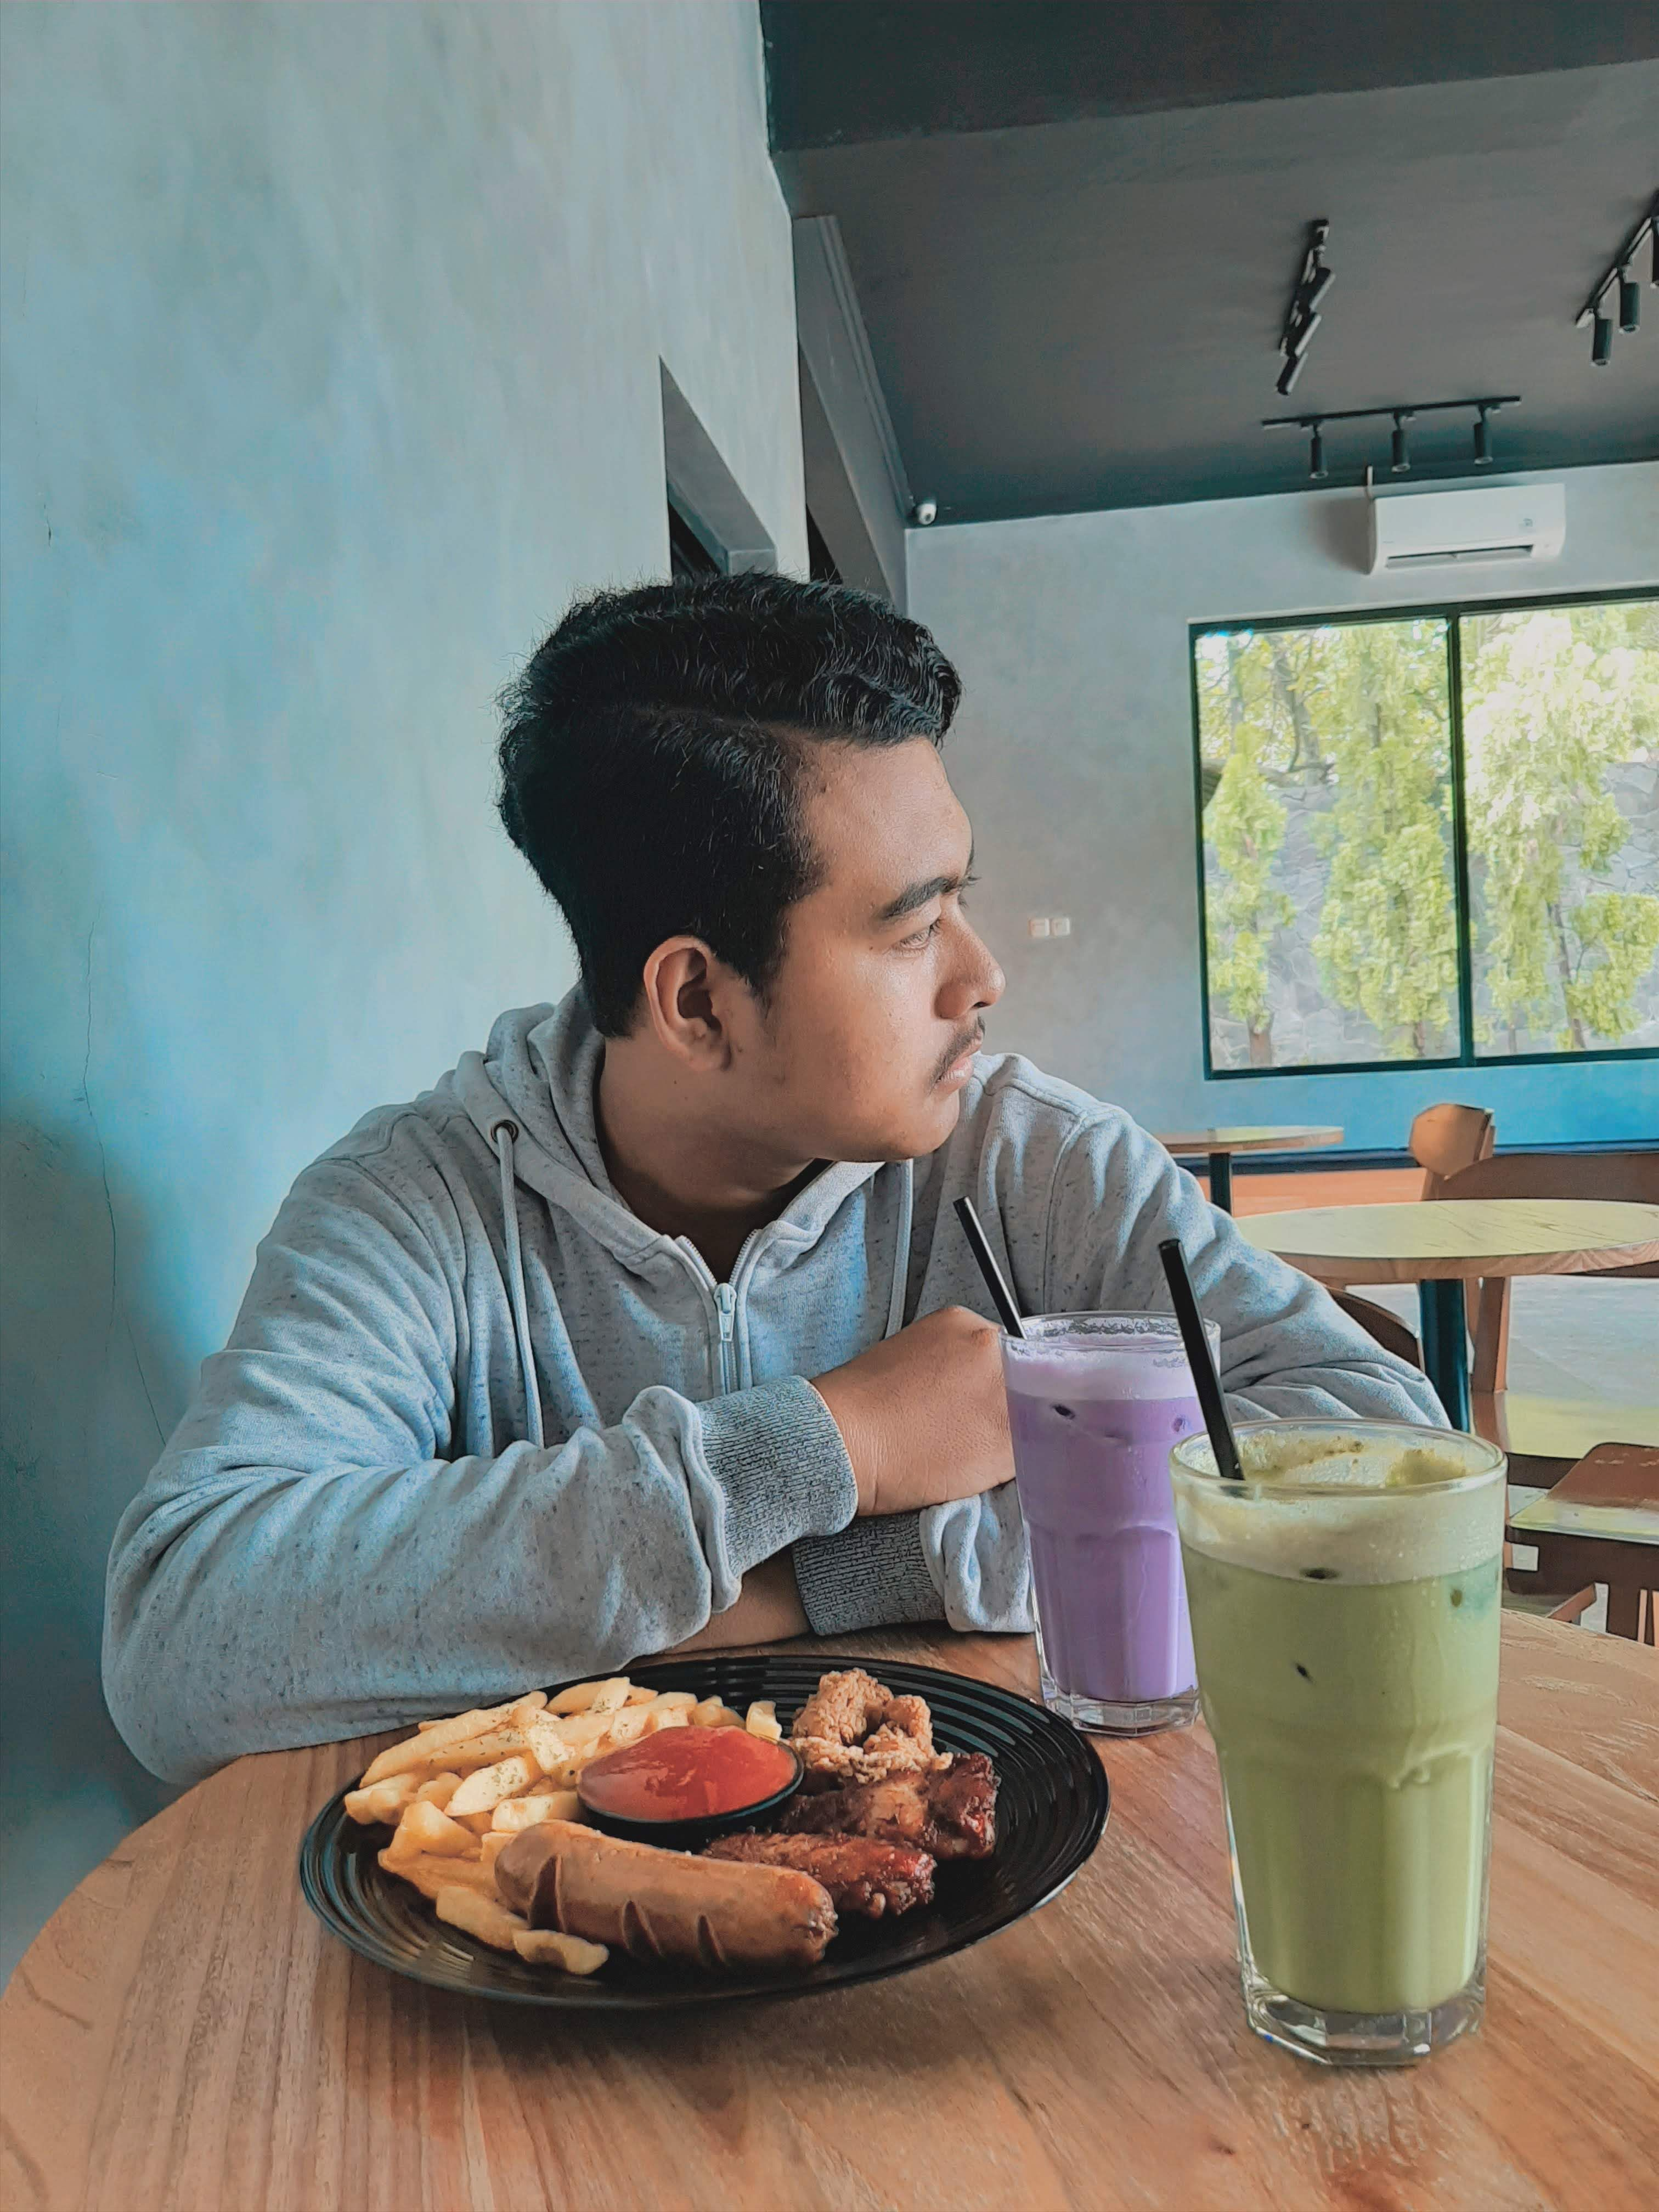 #sundate#caouple#lunch#beloved#boyfriend#qualitytime#food